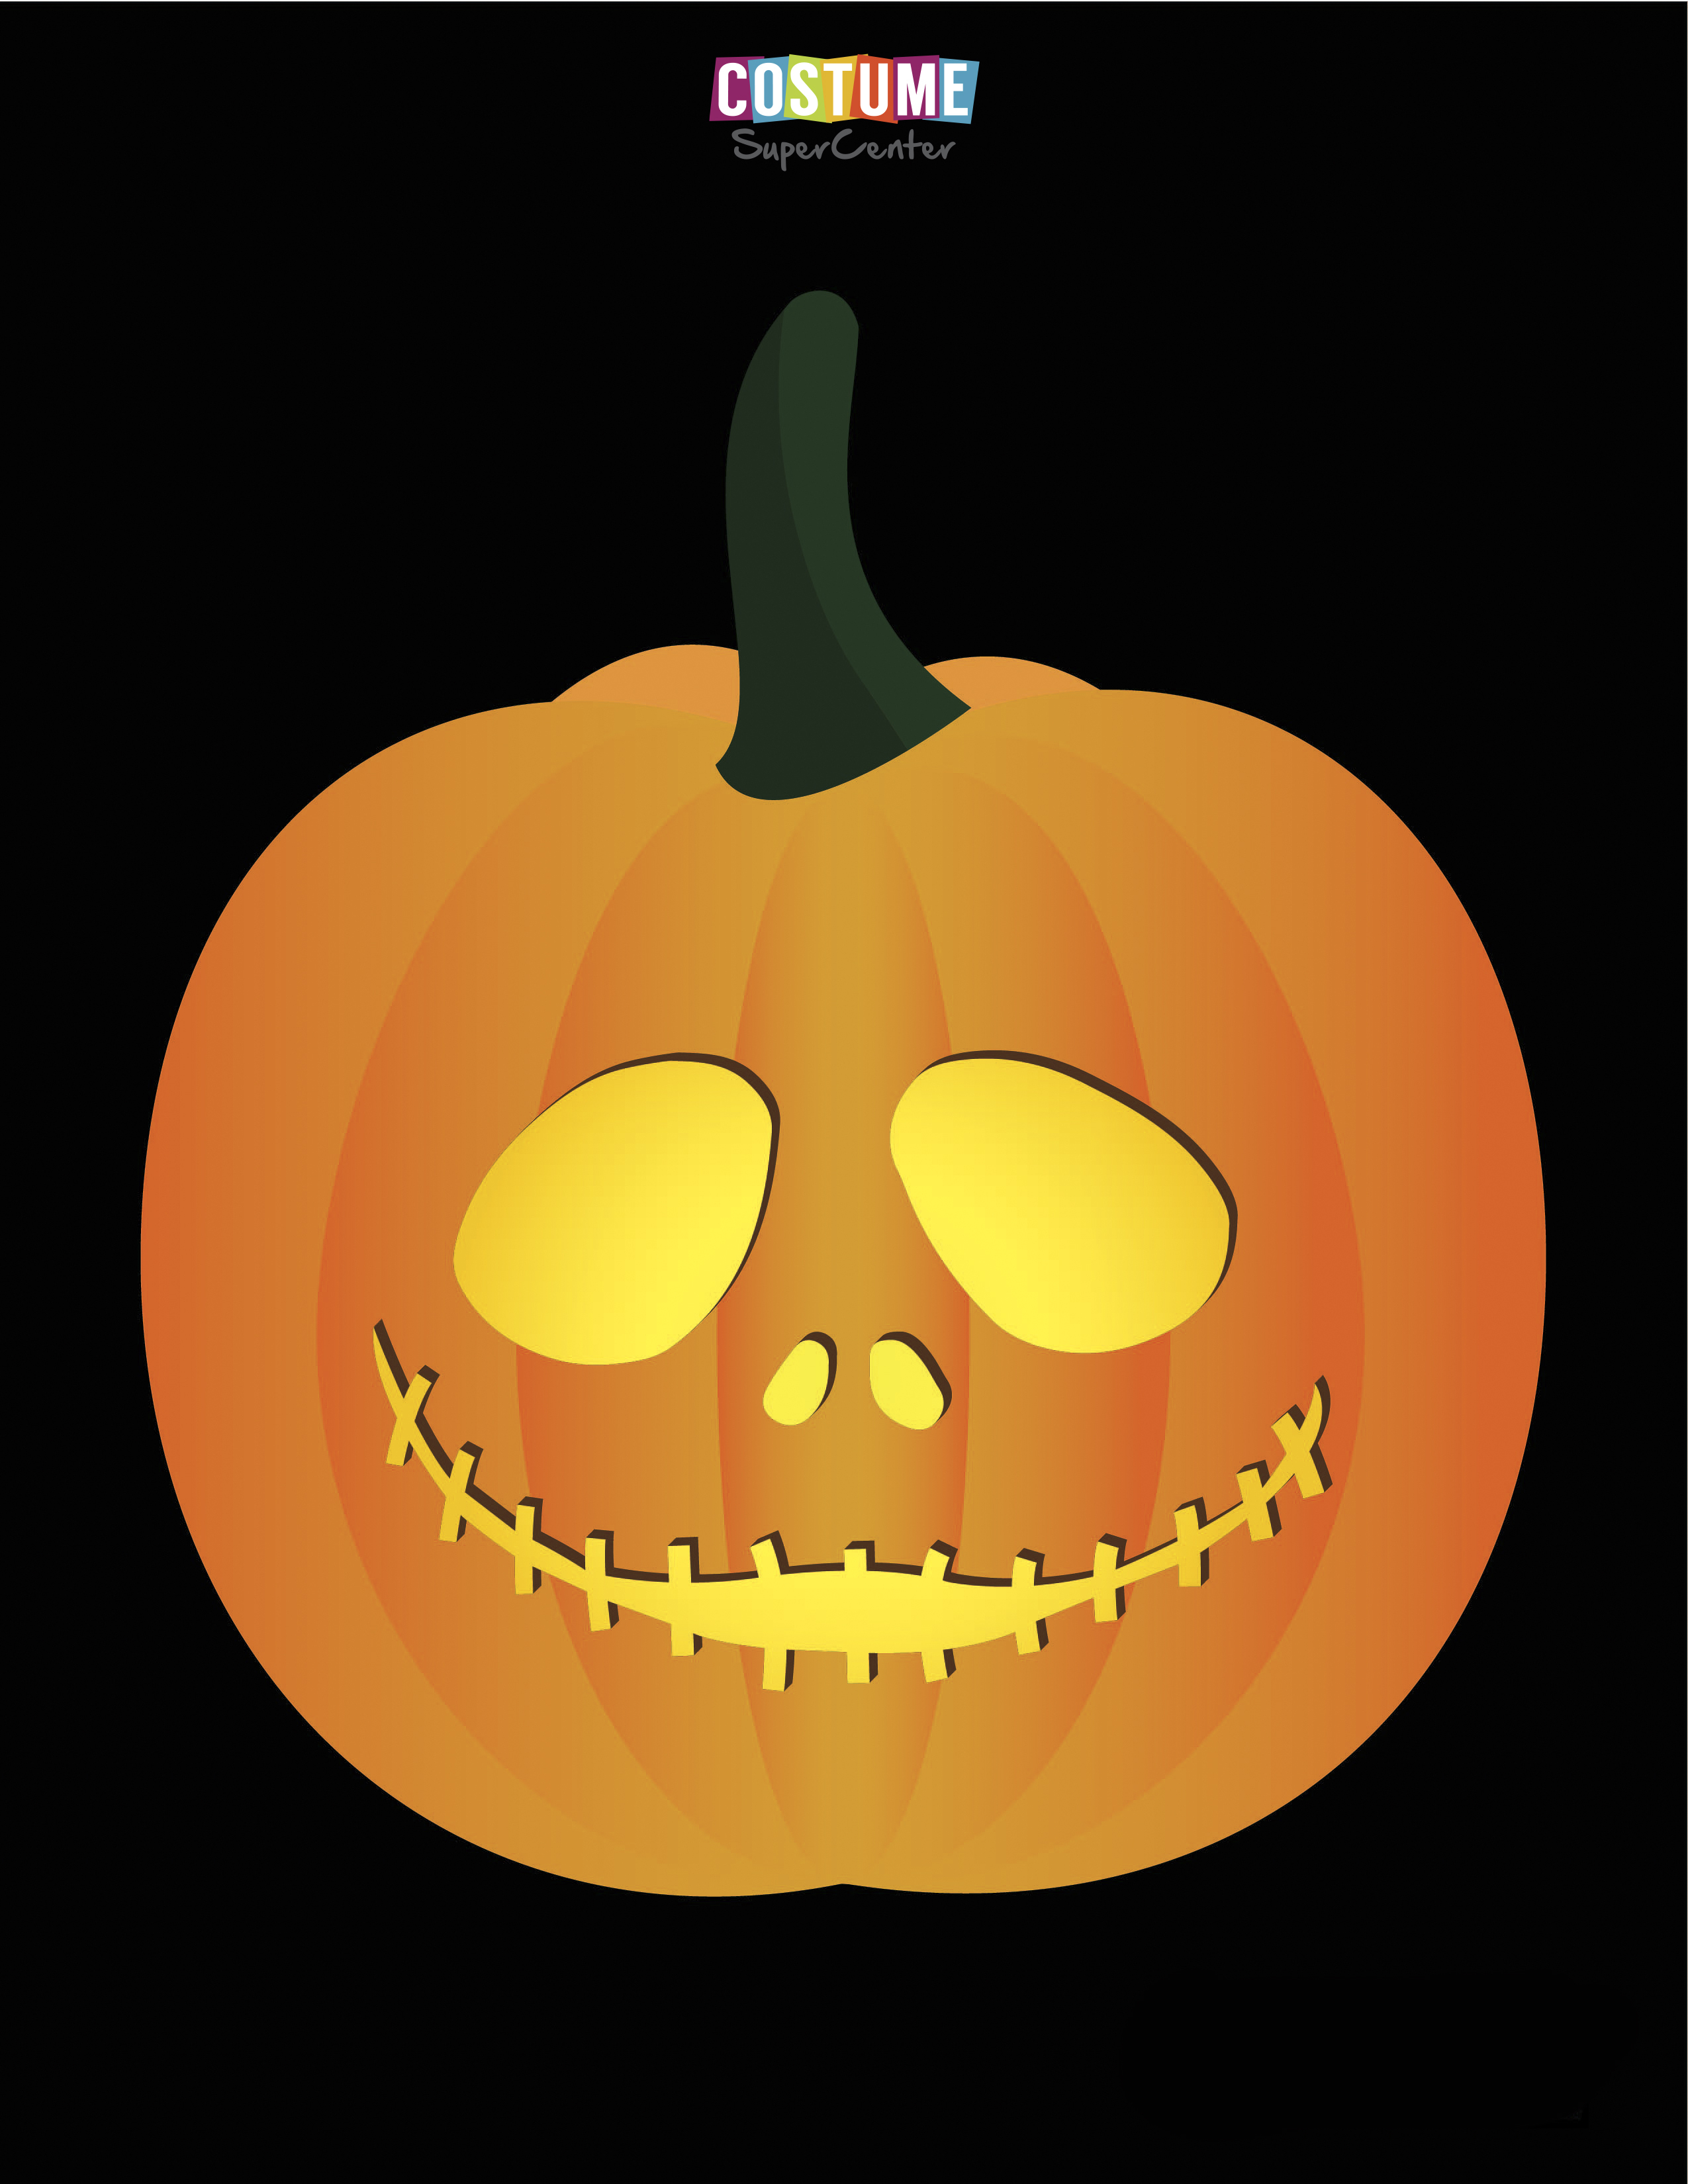 Nightmare Before Christmas Pumpkin Carving Stencils   Costume - Jack Skellington And Sally Pumpkin Stencils Free Printable